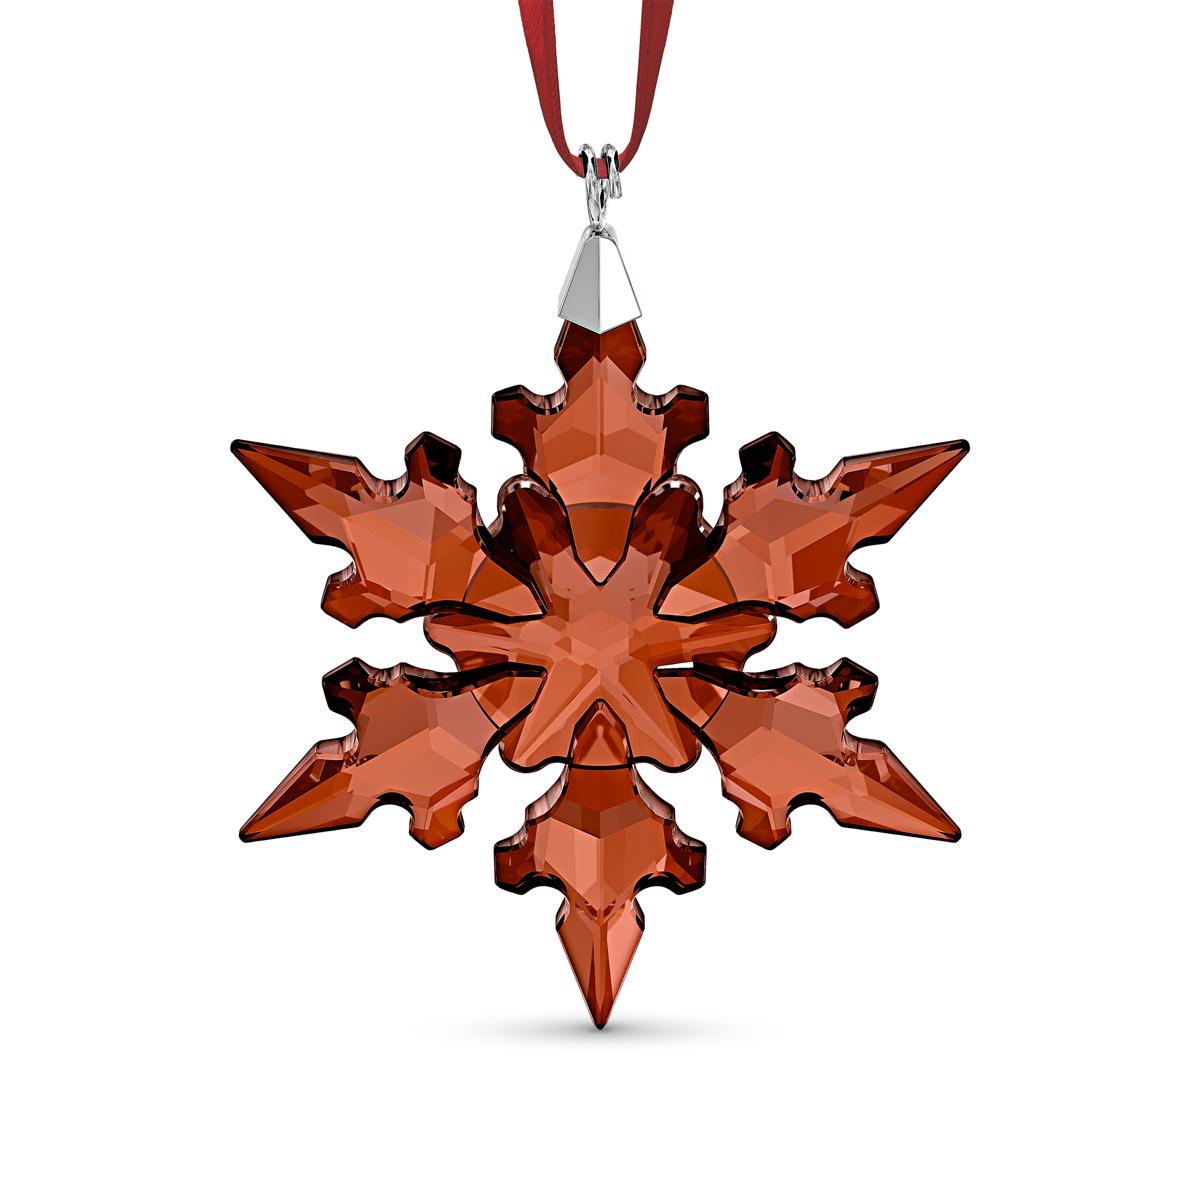 Swarovski Holiday Red 2020 Small Ornament